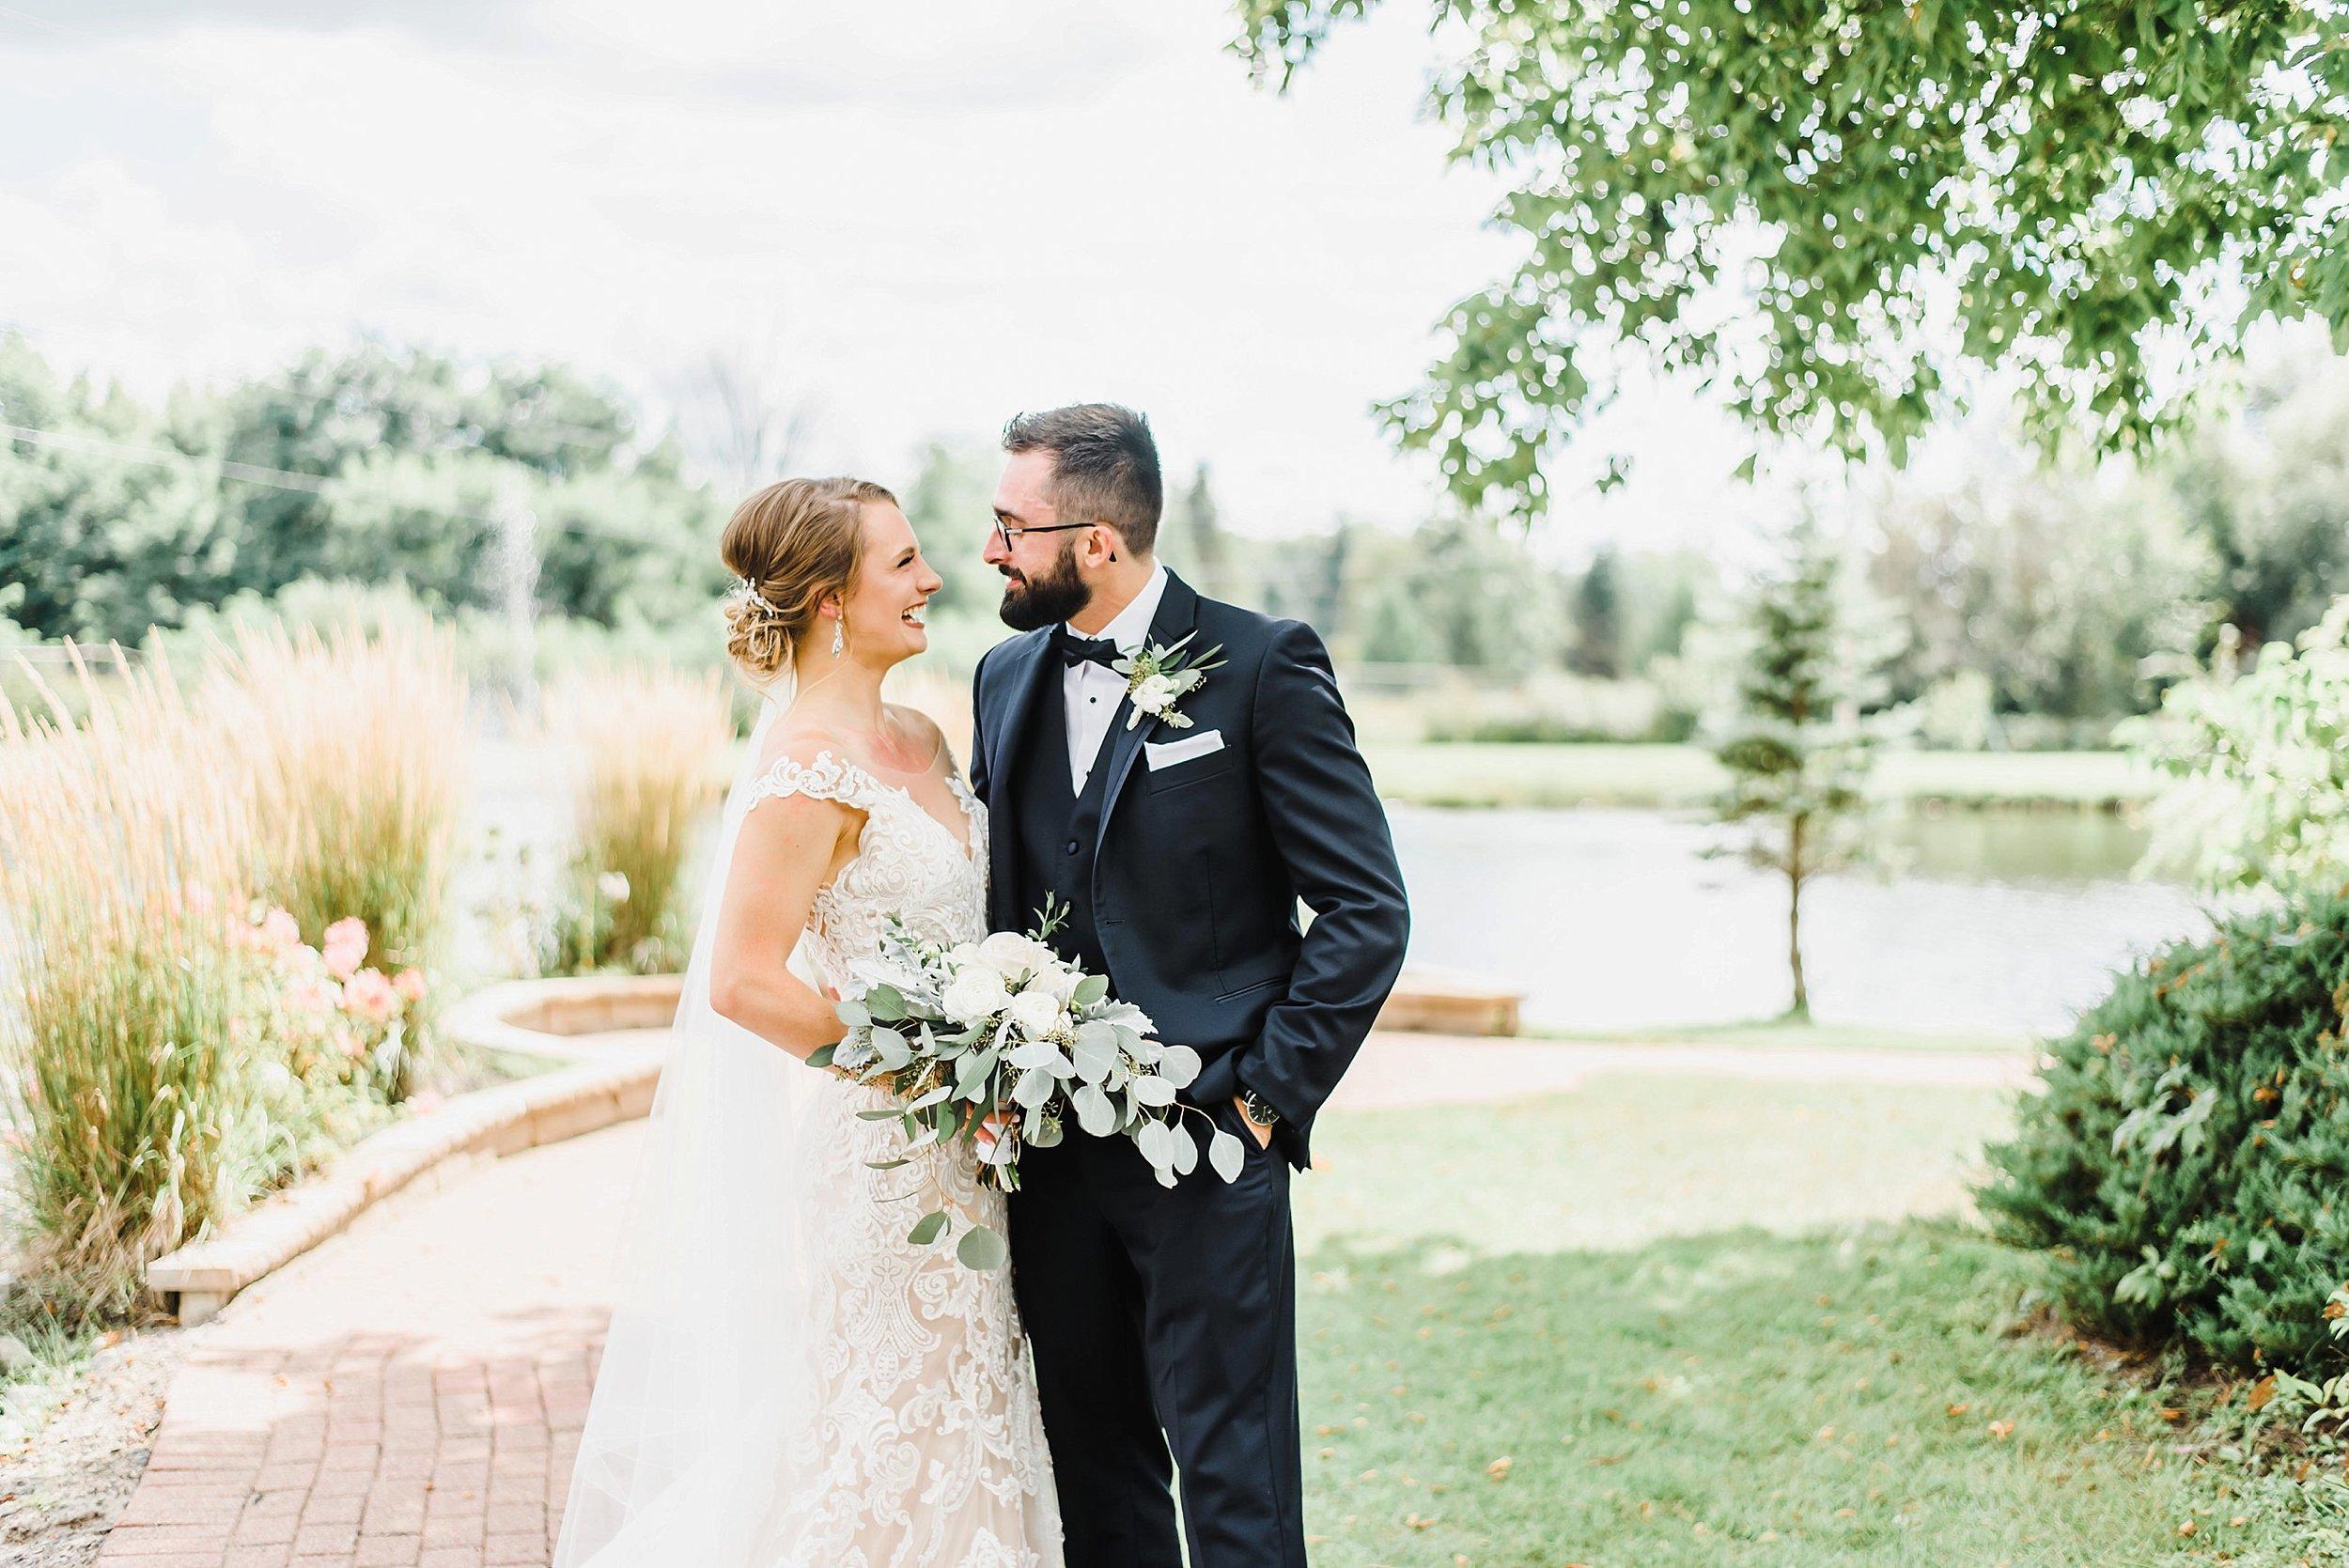 light airy indie fine art ottawa wedding photographer | Ali and Batoul Photography_1245.jpg